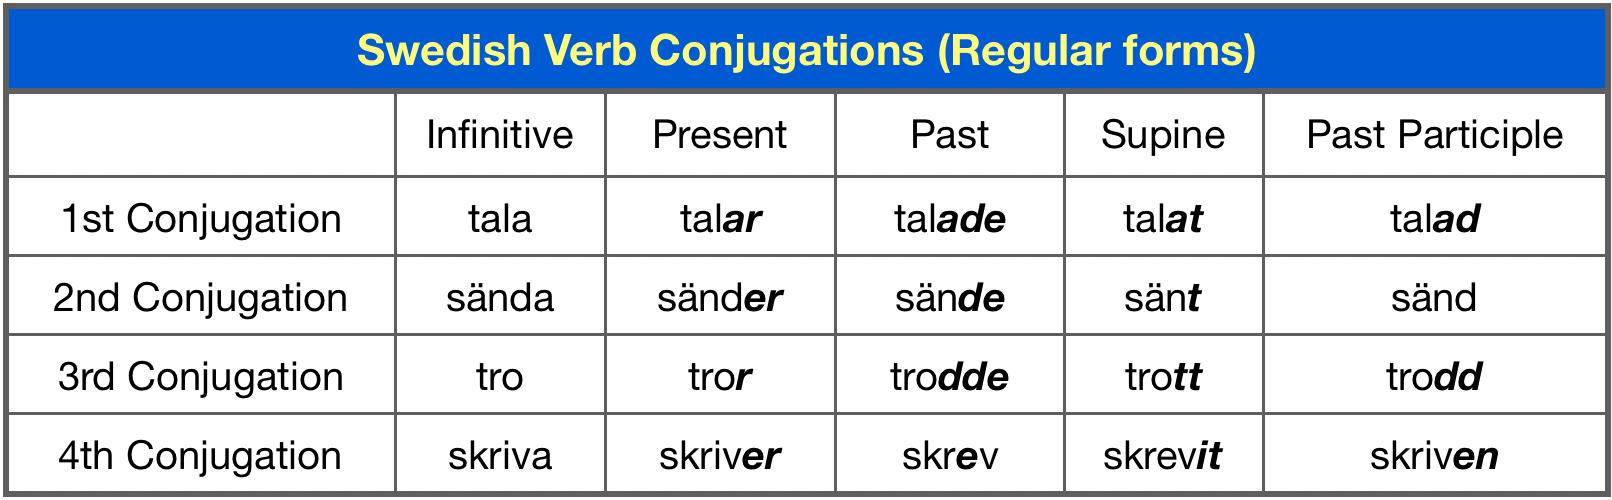 Swedish Verb Groups